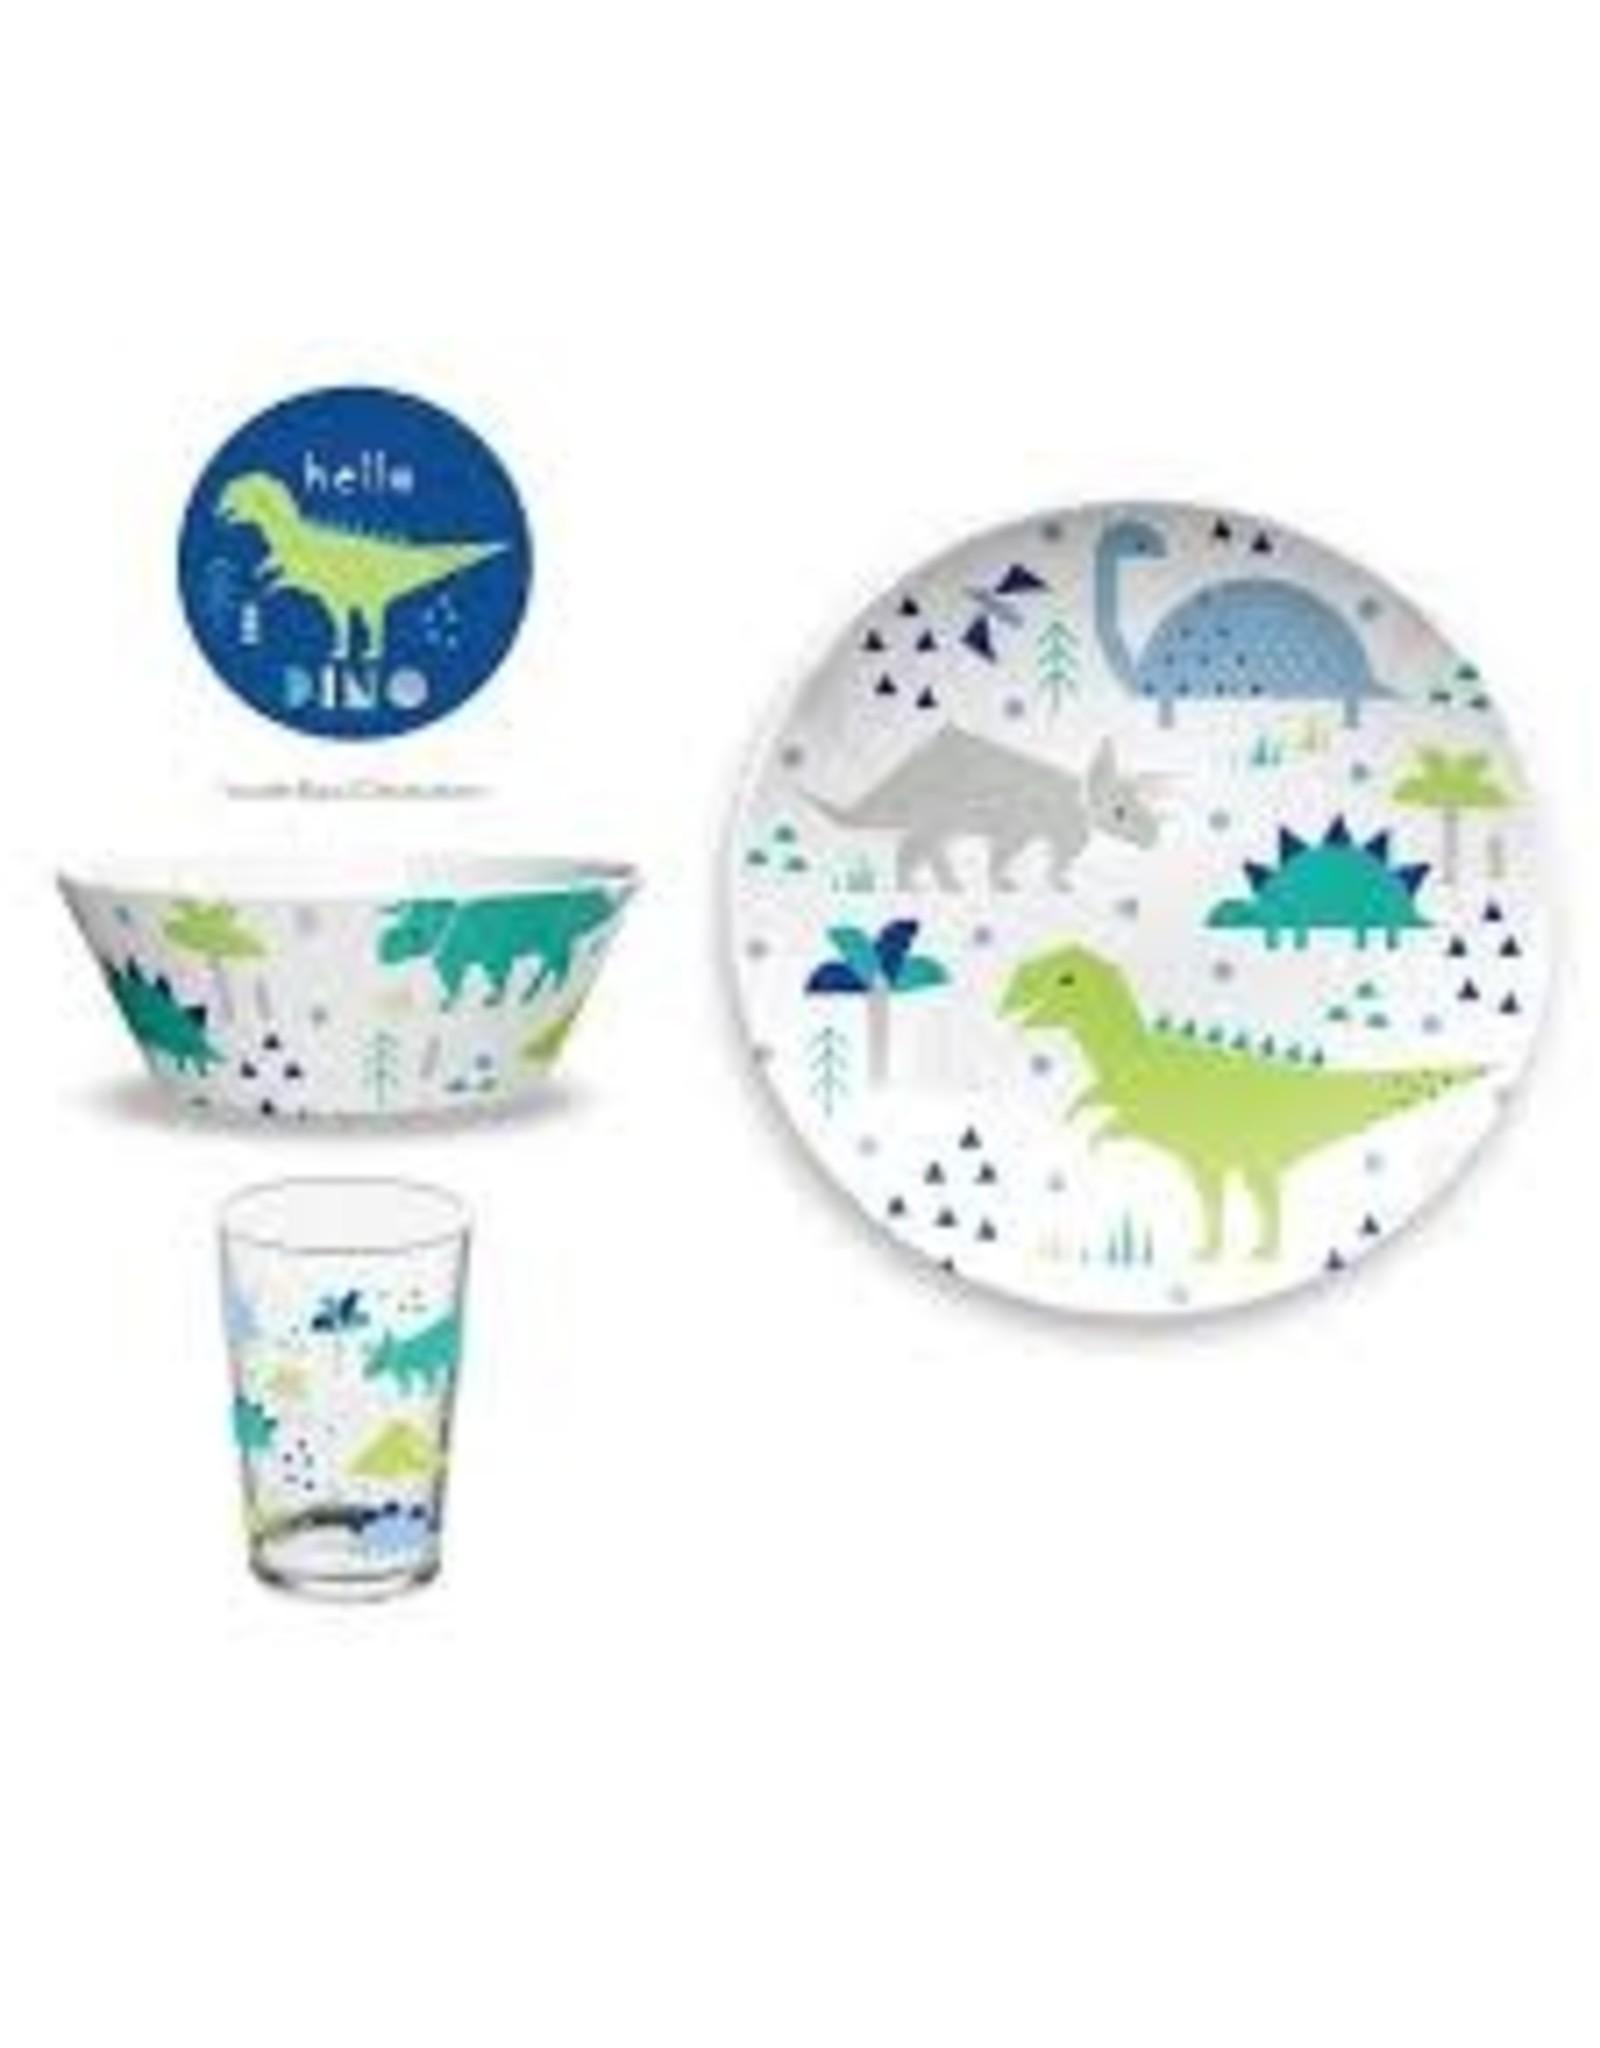 "TarHong TarHong- Hello Dino Kids Set, 8.5"" Plate, 6.3"" x 2.4""/ 36 oz. Bowl, 10.7 oz. Cup"